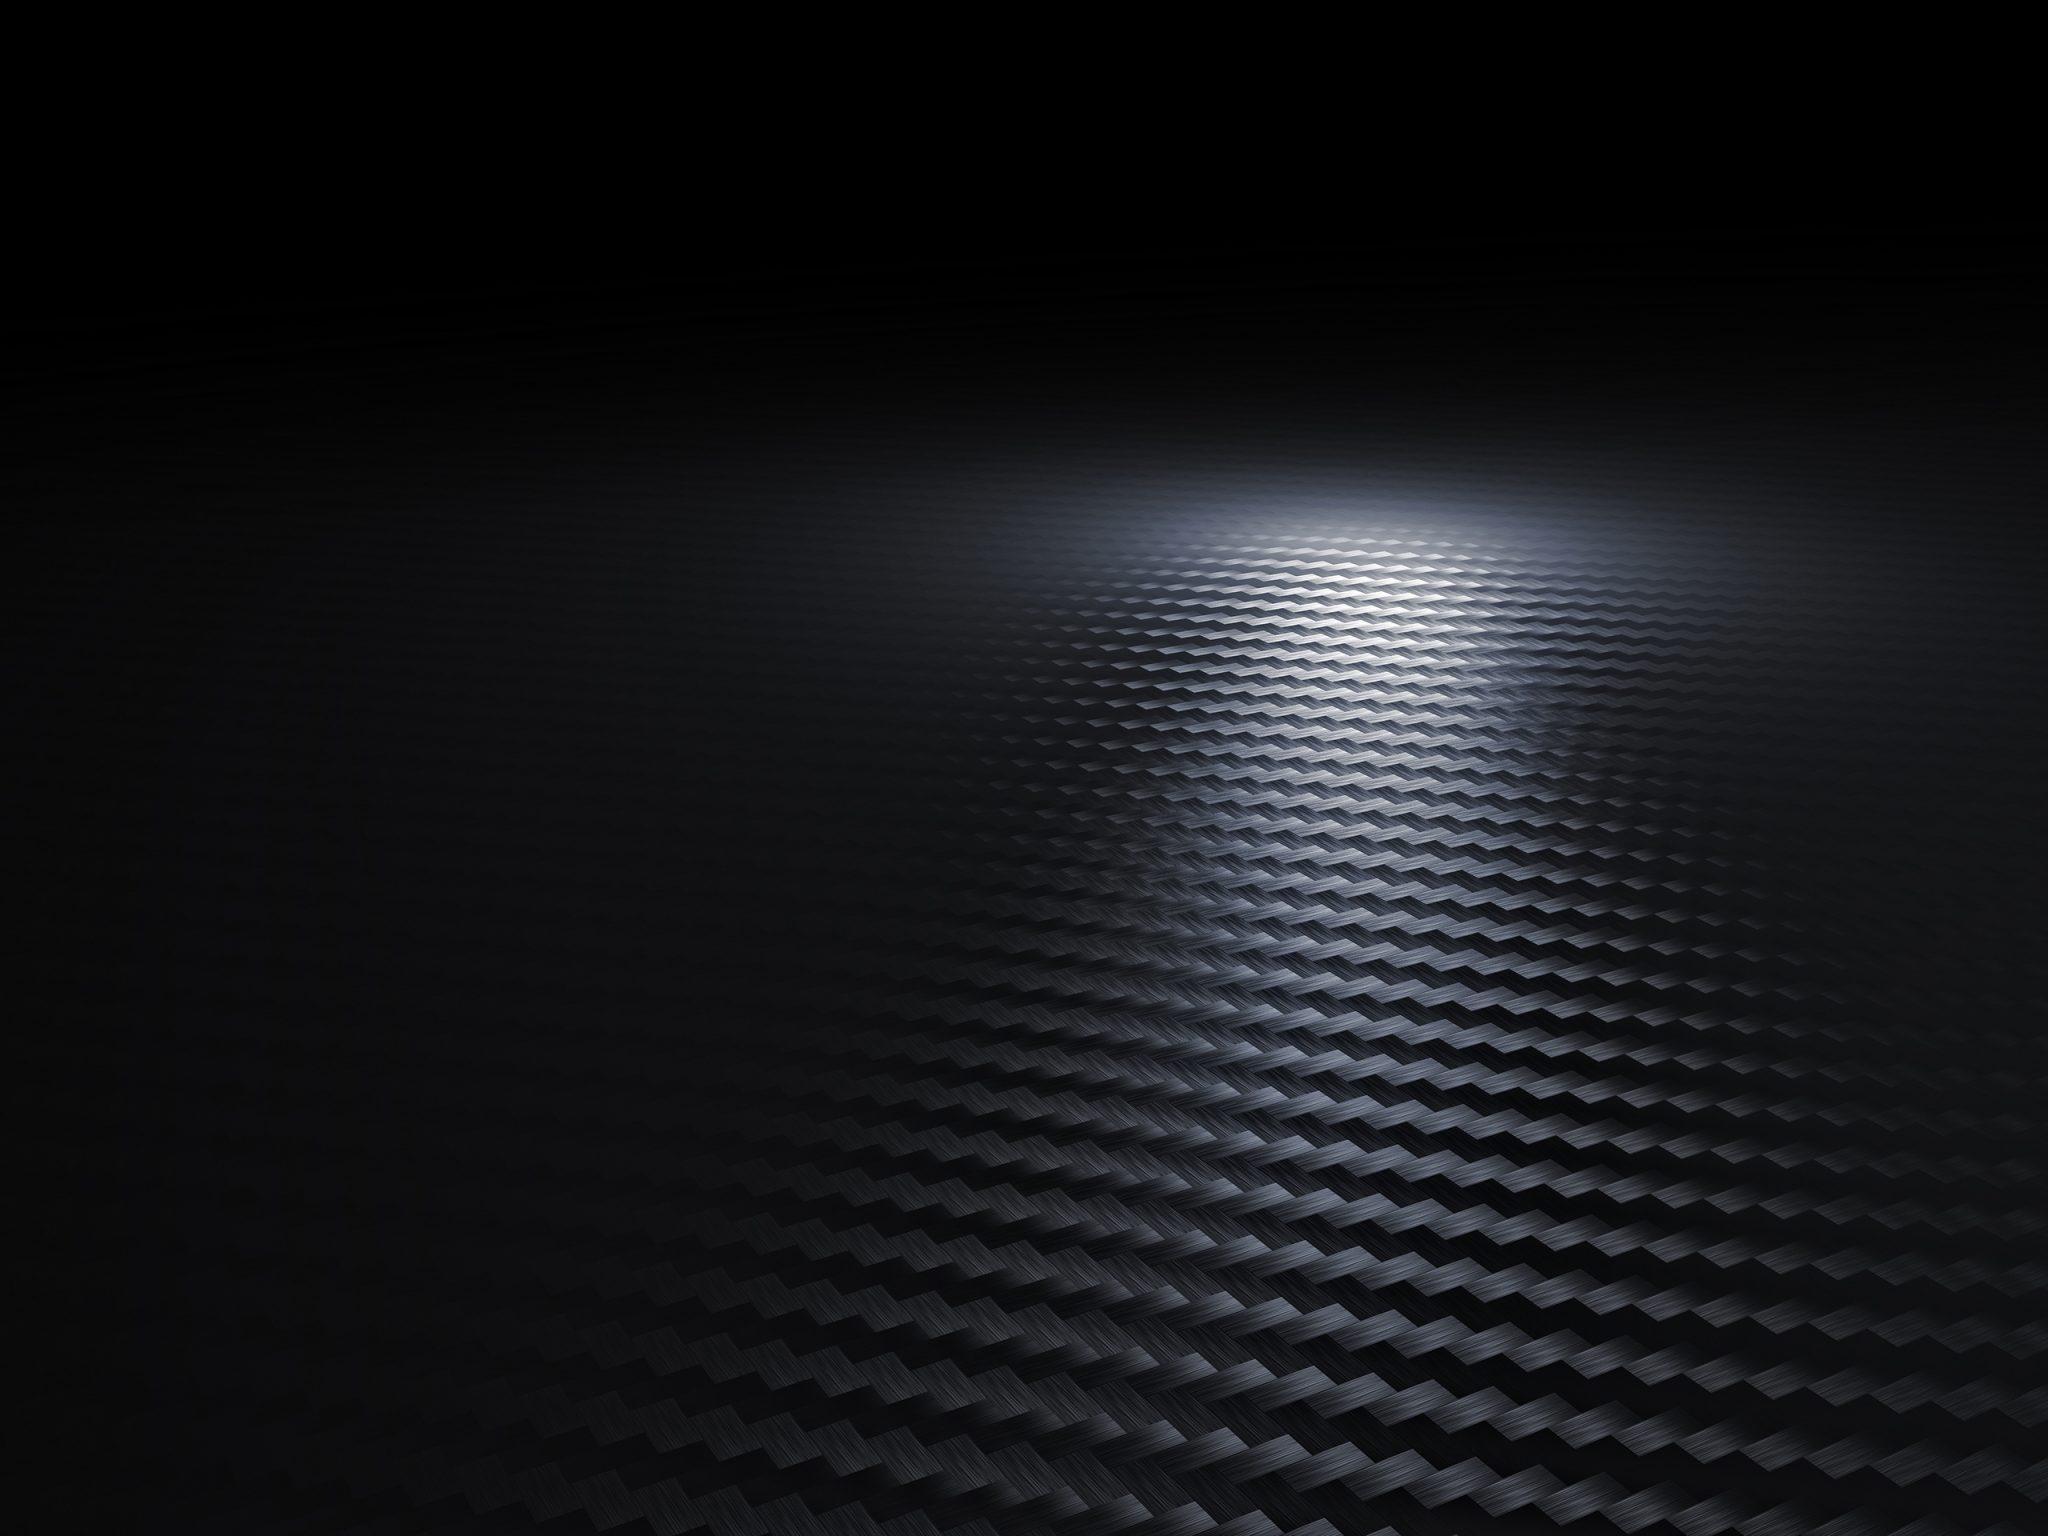 kolfiber_bakgrund